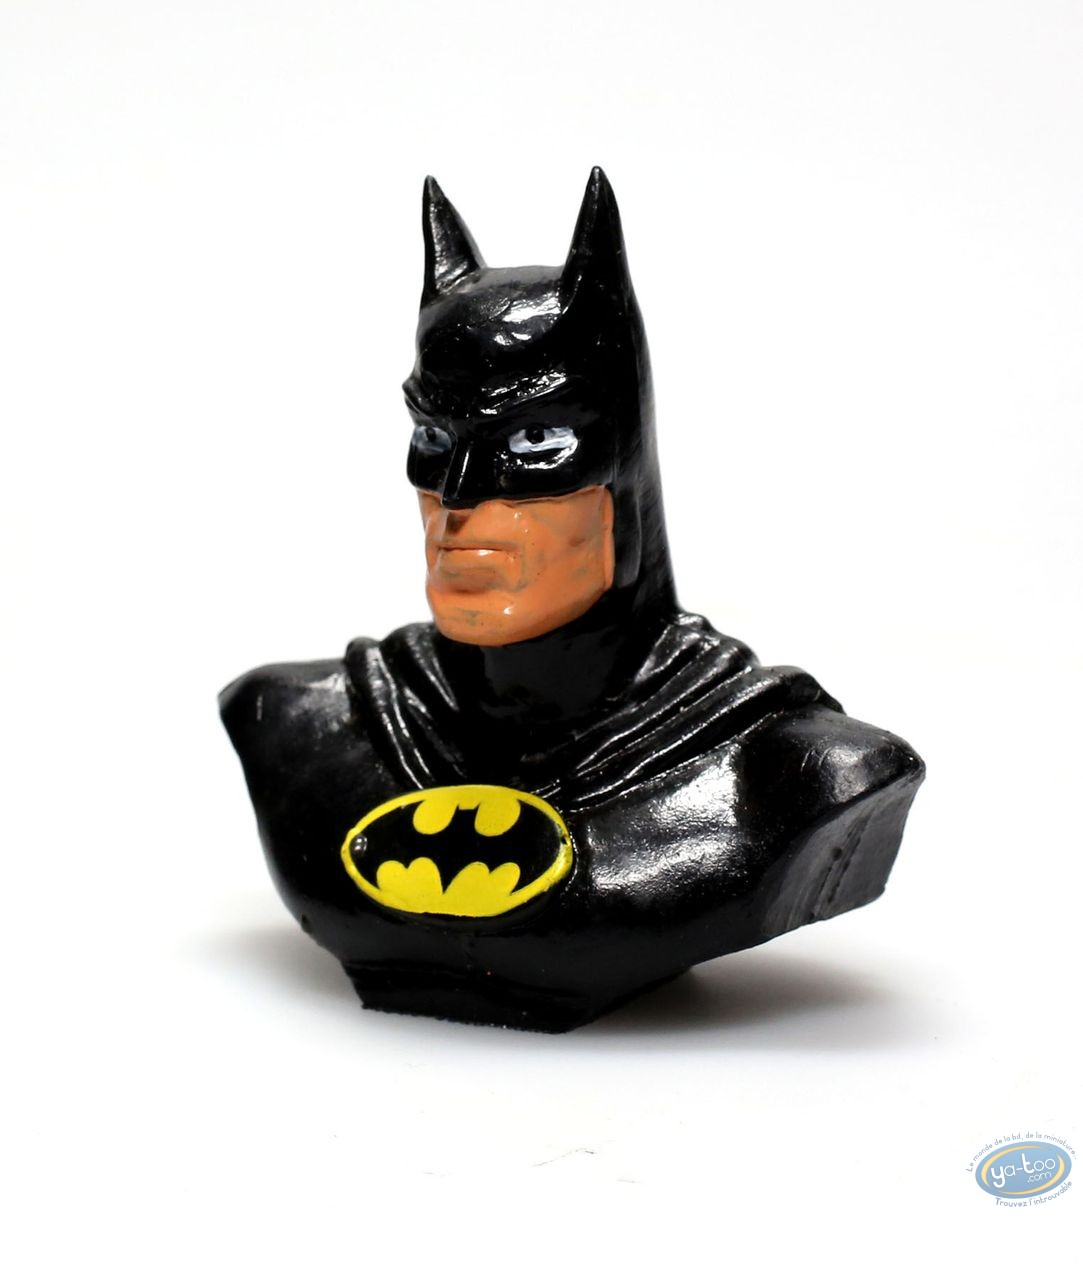 Plastic Figurine, Batman : Bust of Batman